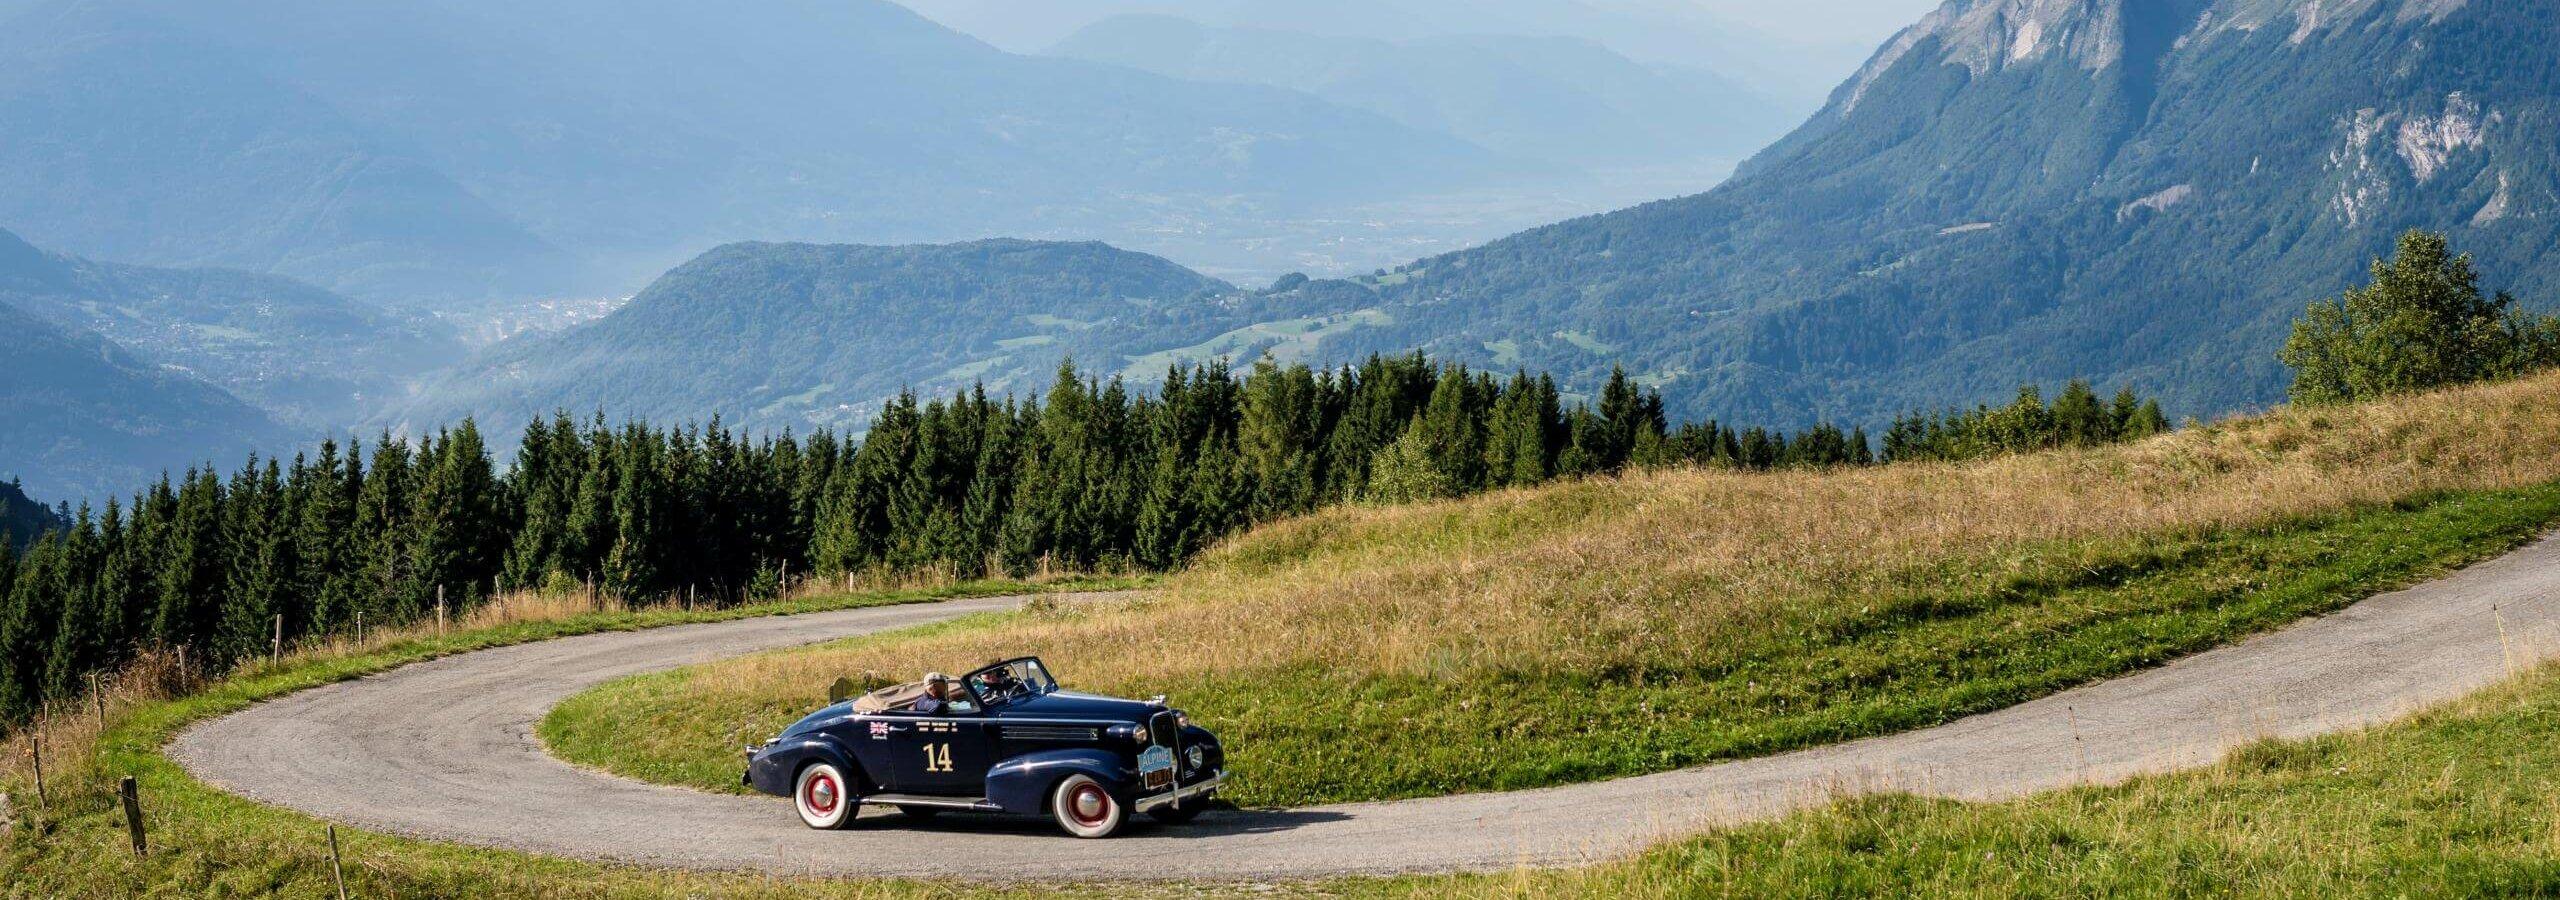 Tysers Insurance Brokers | International Motoring Rallies & Adventures